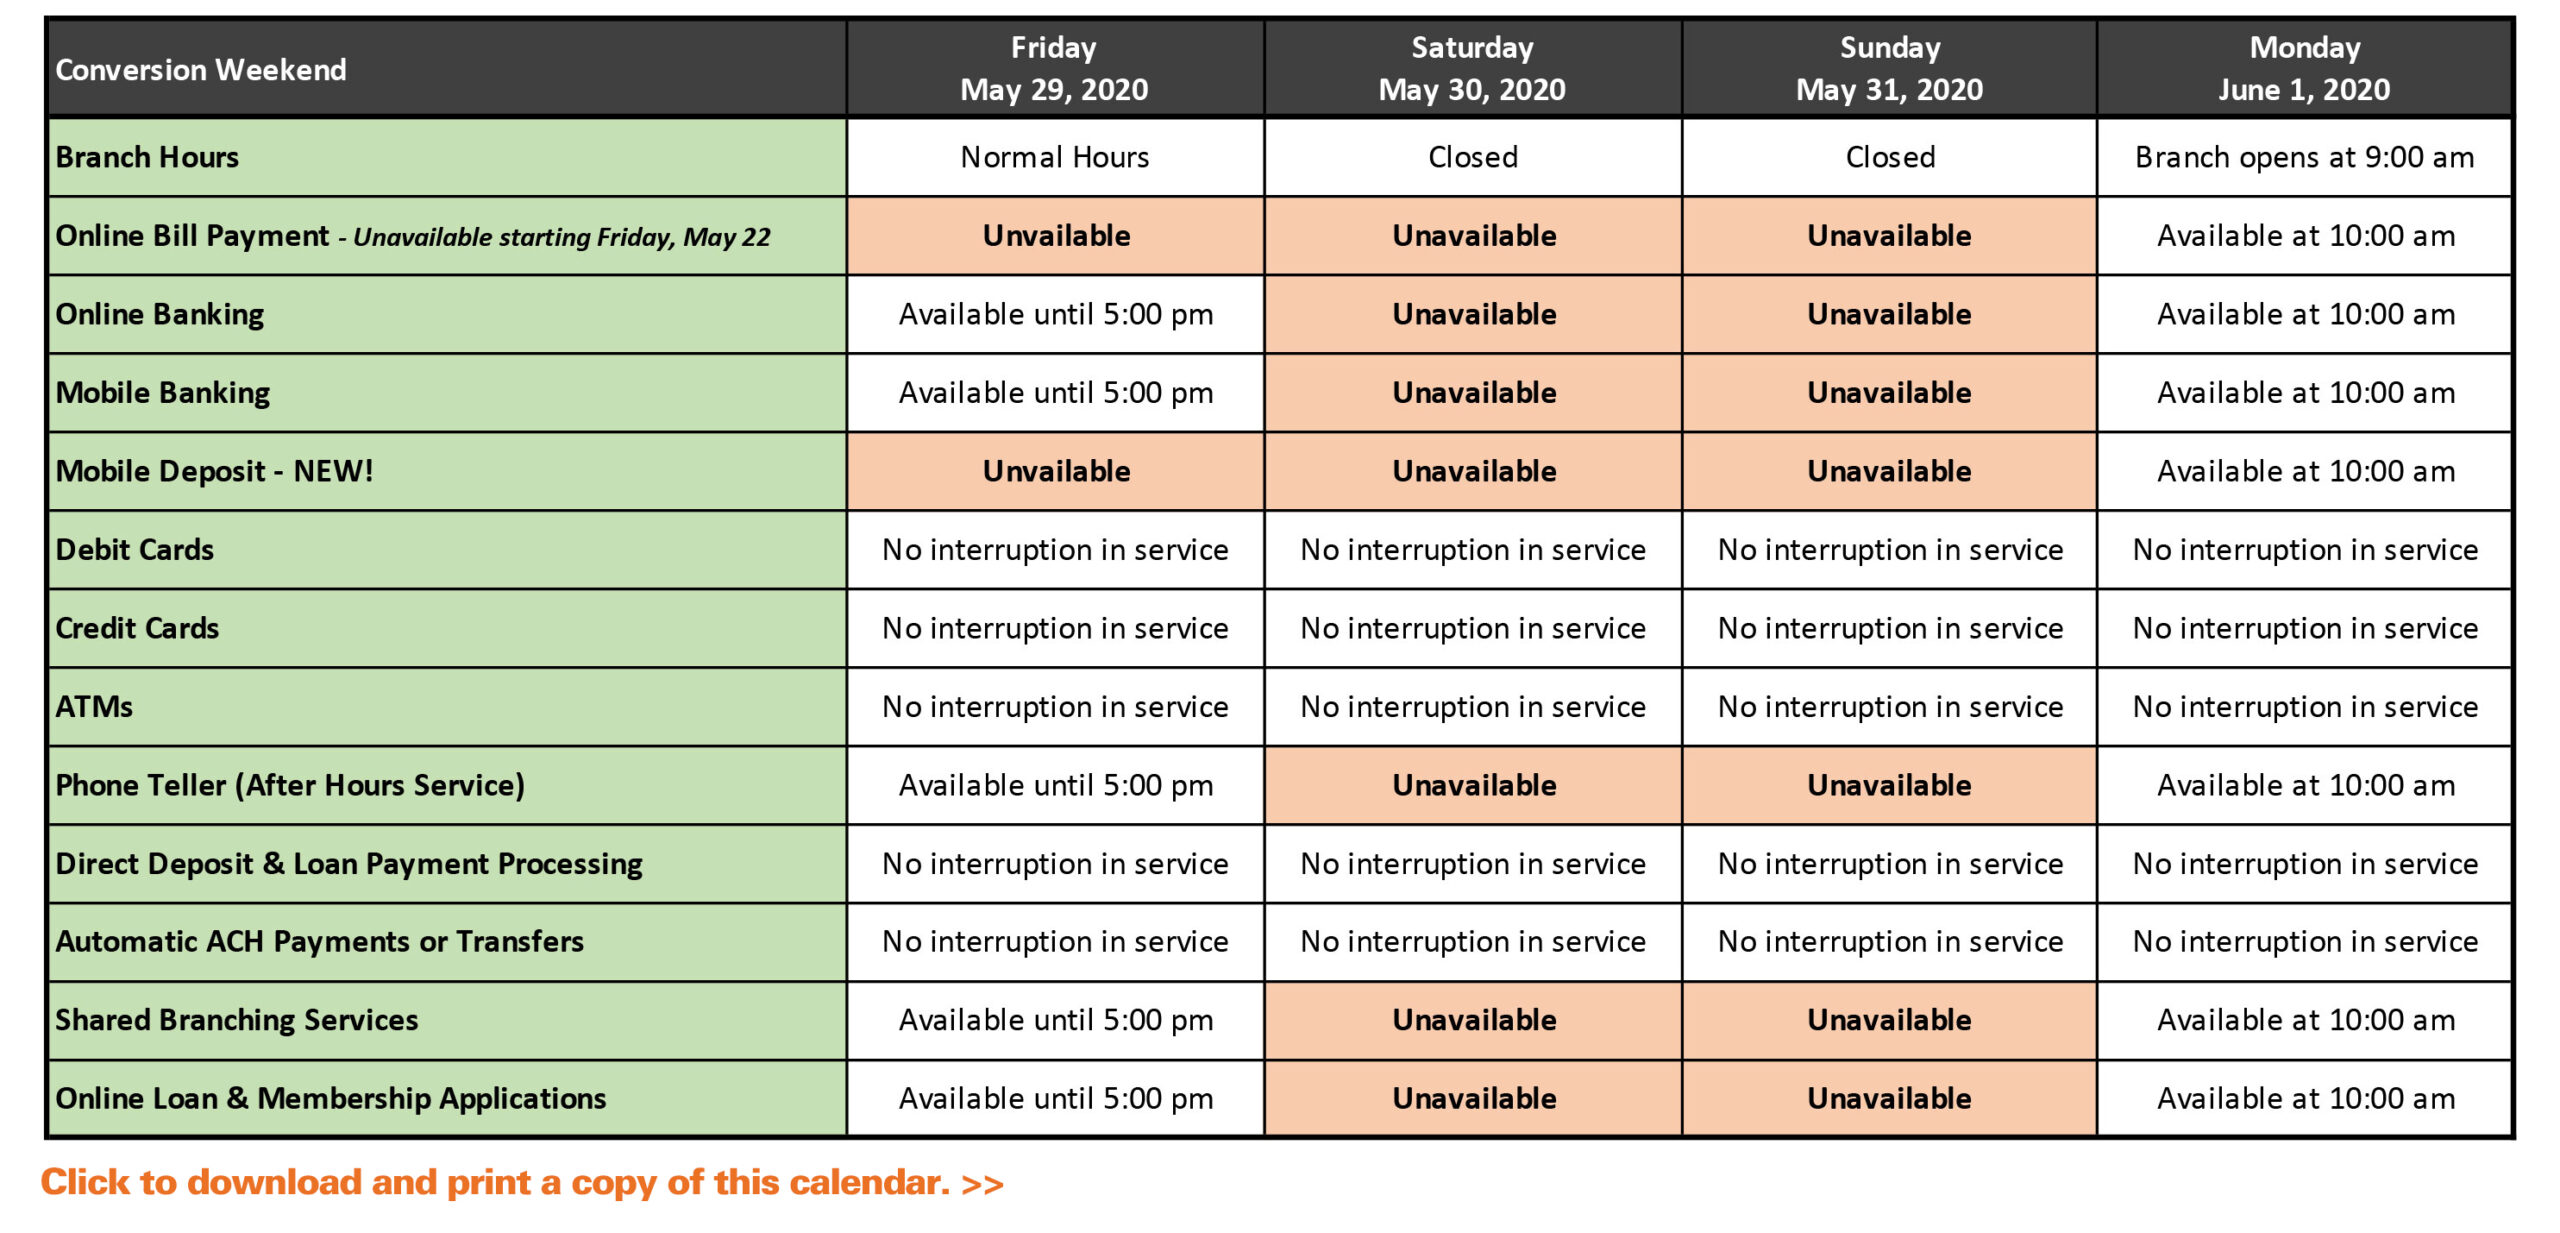 conversion-schedule-link